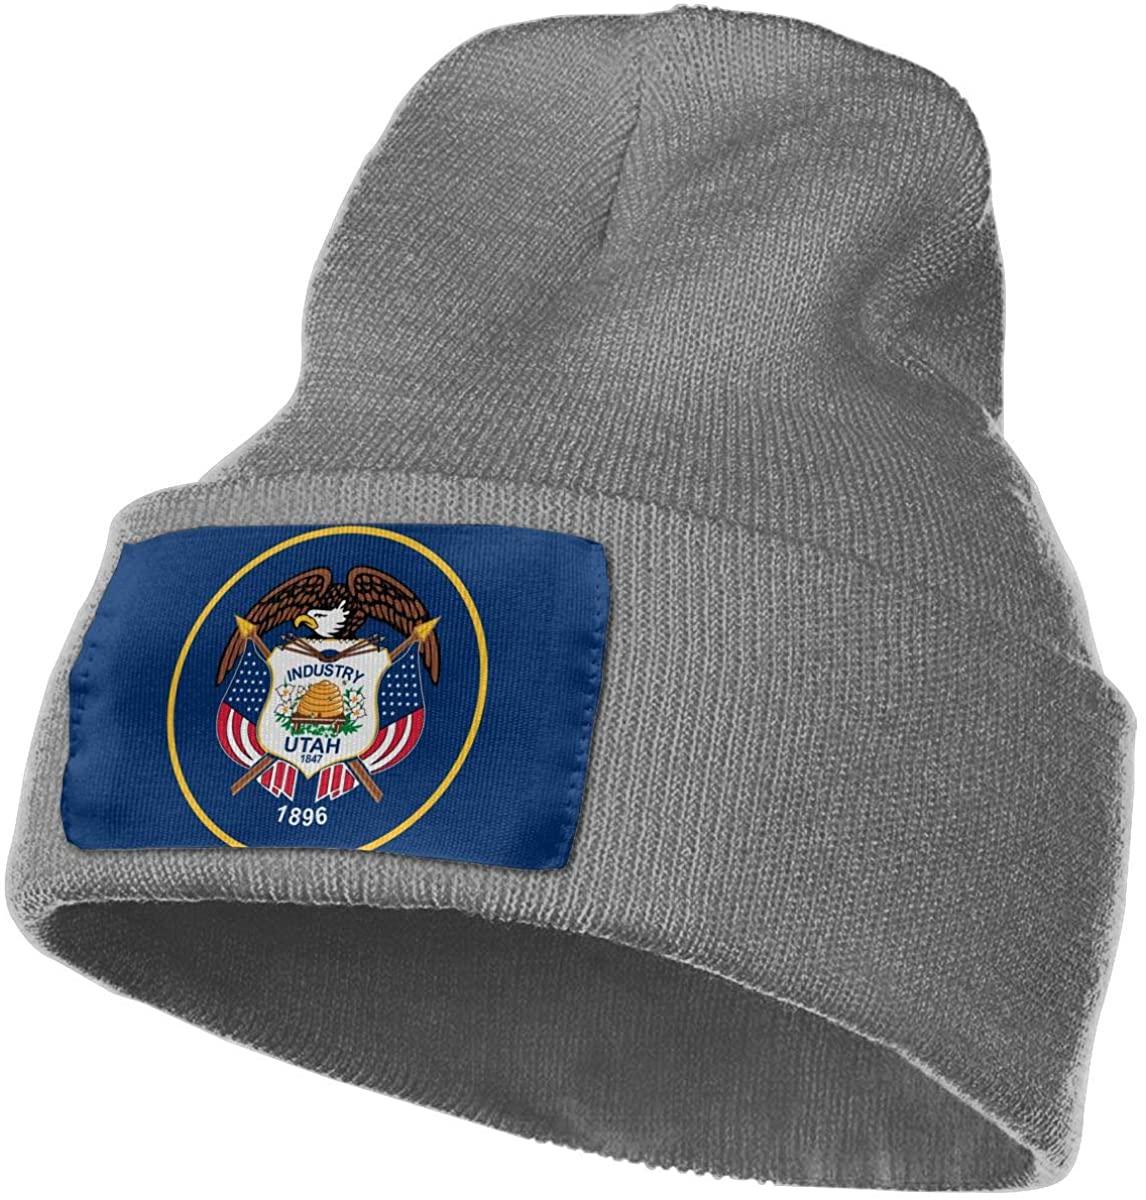 SOURCE POINT Unisex Beanie Hat Utah State Flag Knit Hat Cap Skull Cap